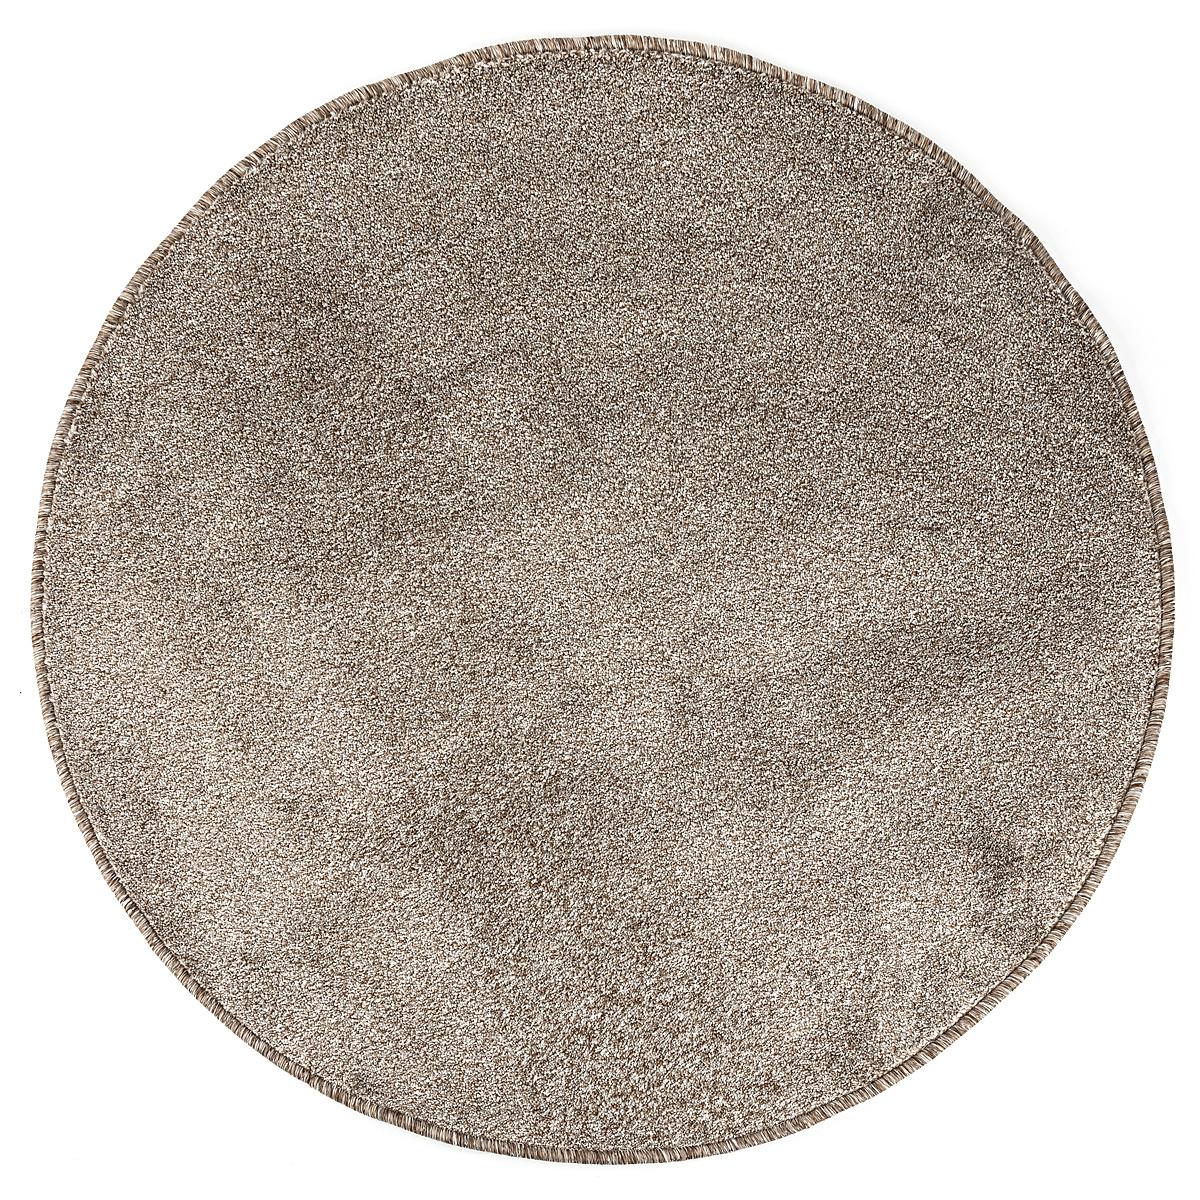 Vopi Kusový koberec Apollo soft béžová, 100 cm